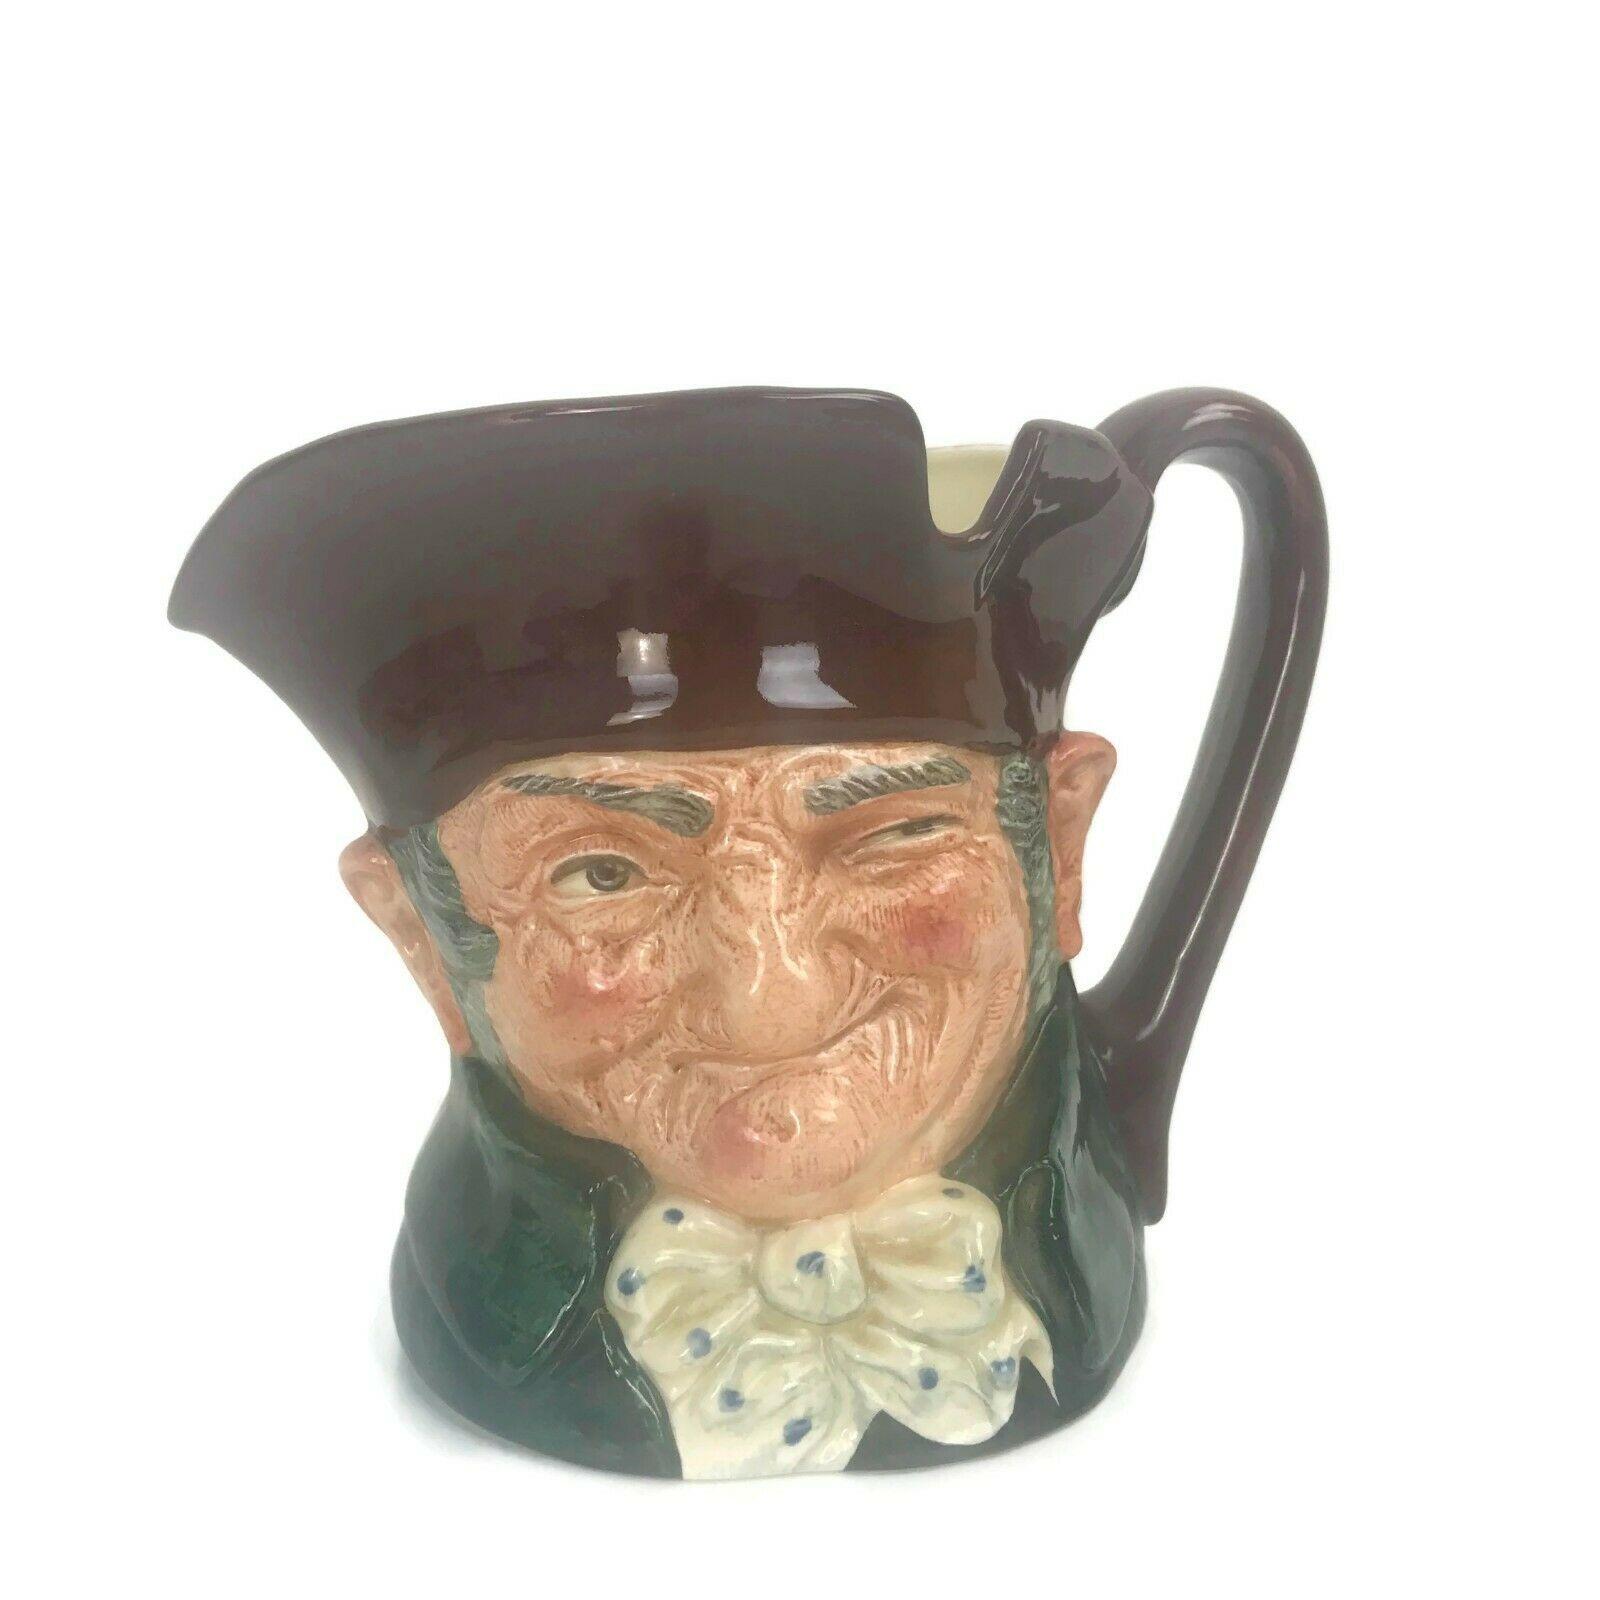 "Vintage Royal Doulton England Old Charley Toby Mug Jug HN 5420 Large Size 6"" B12 - $25.02"